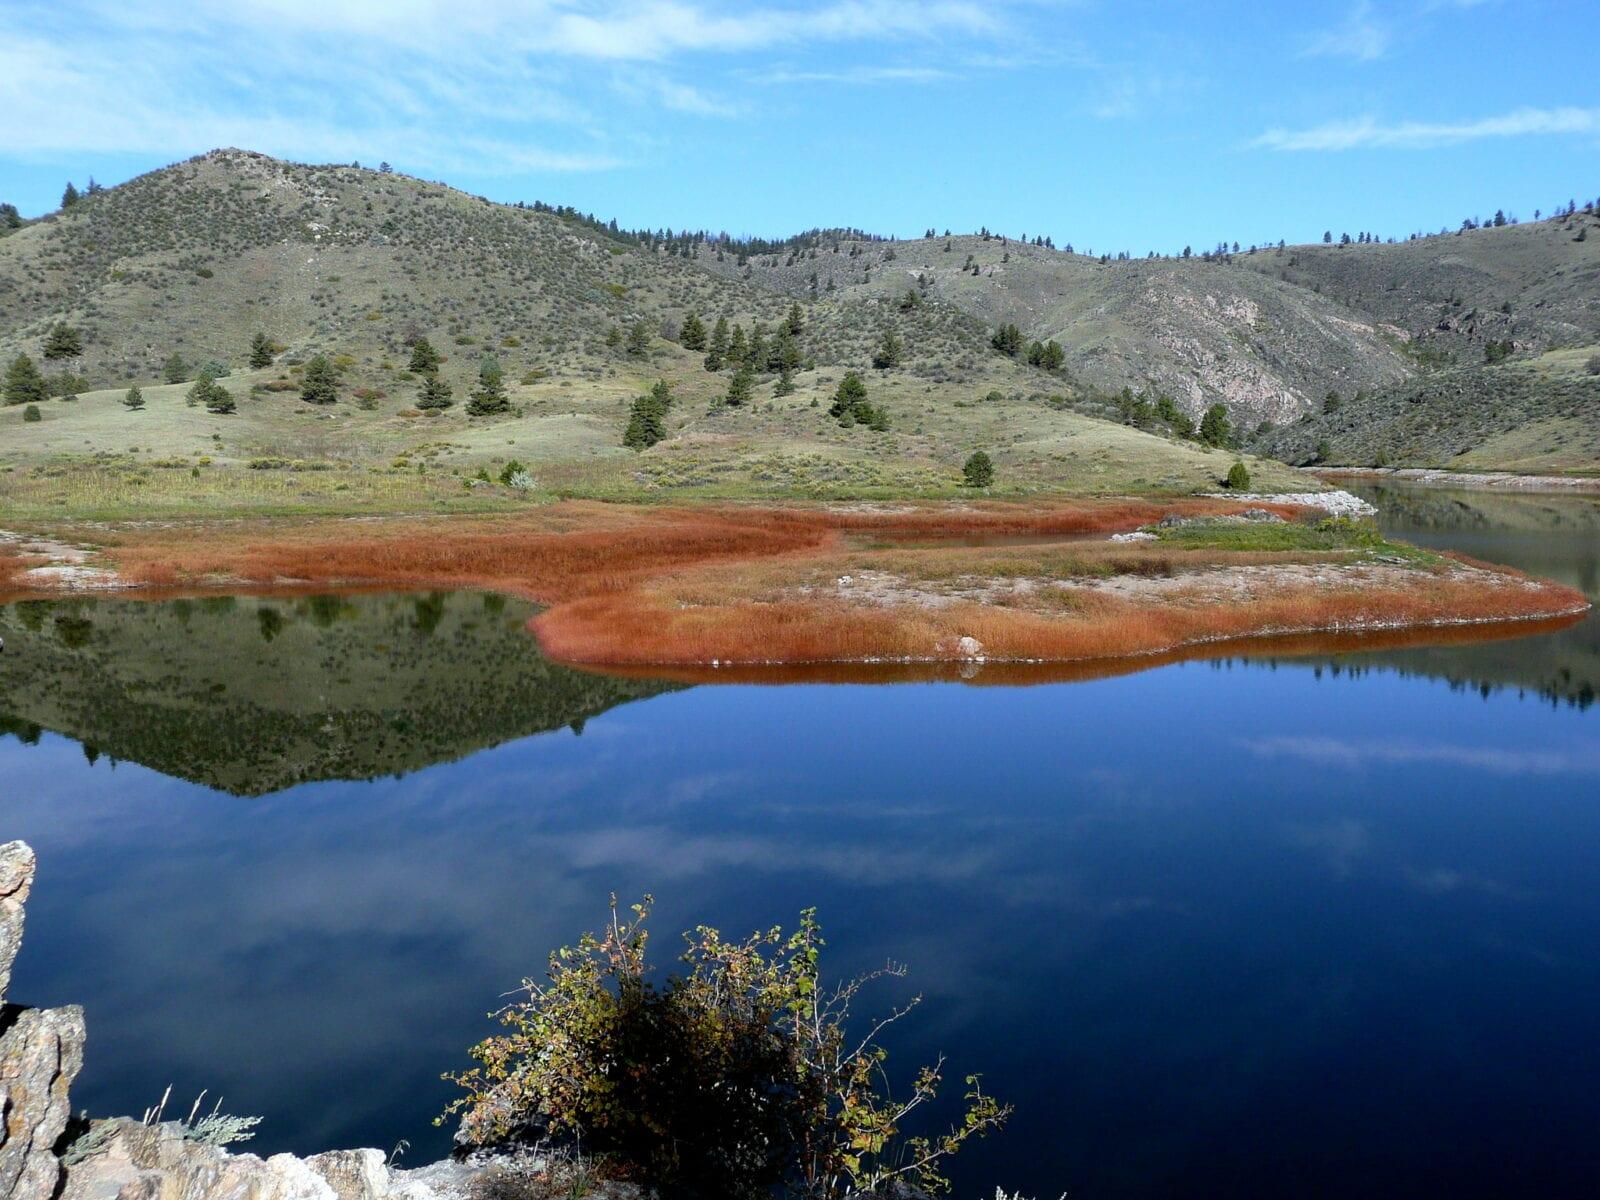 Image of the Seaman Reservoir in Bellvue, Colorado